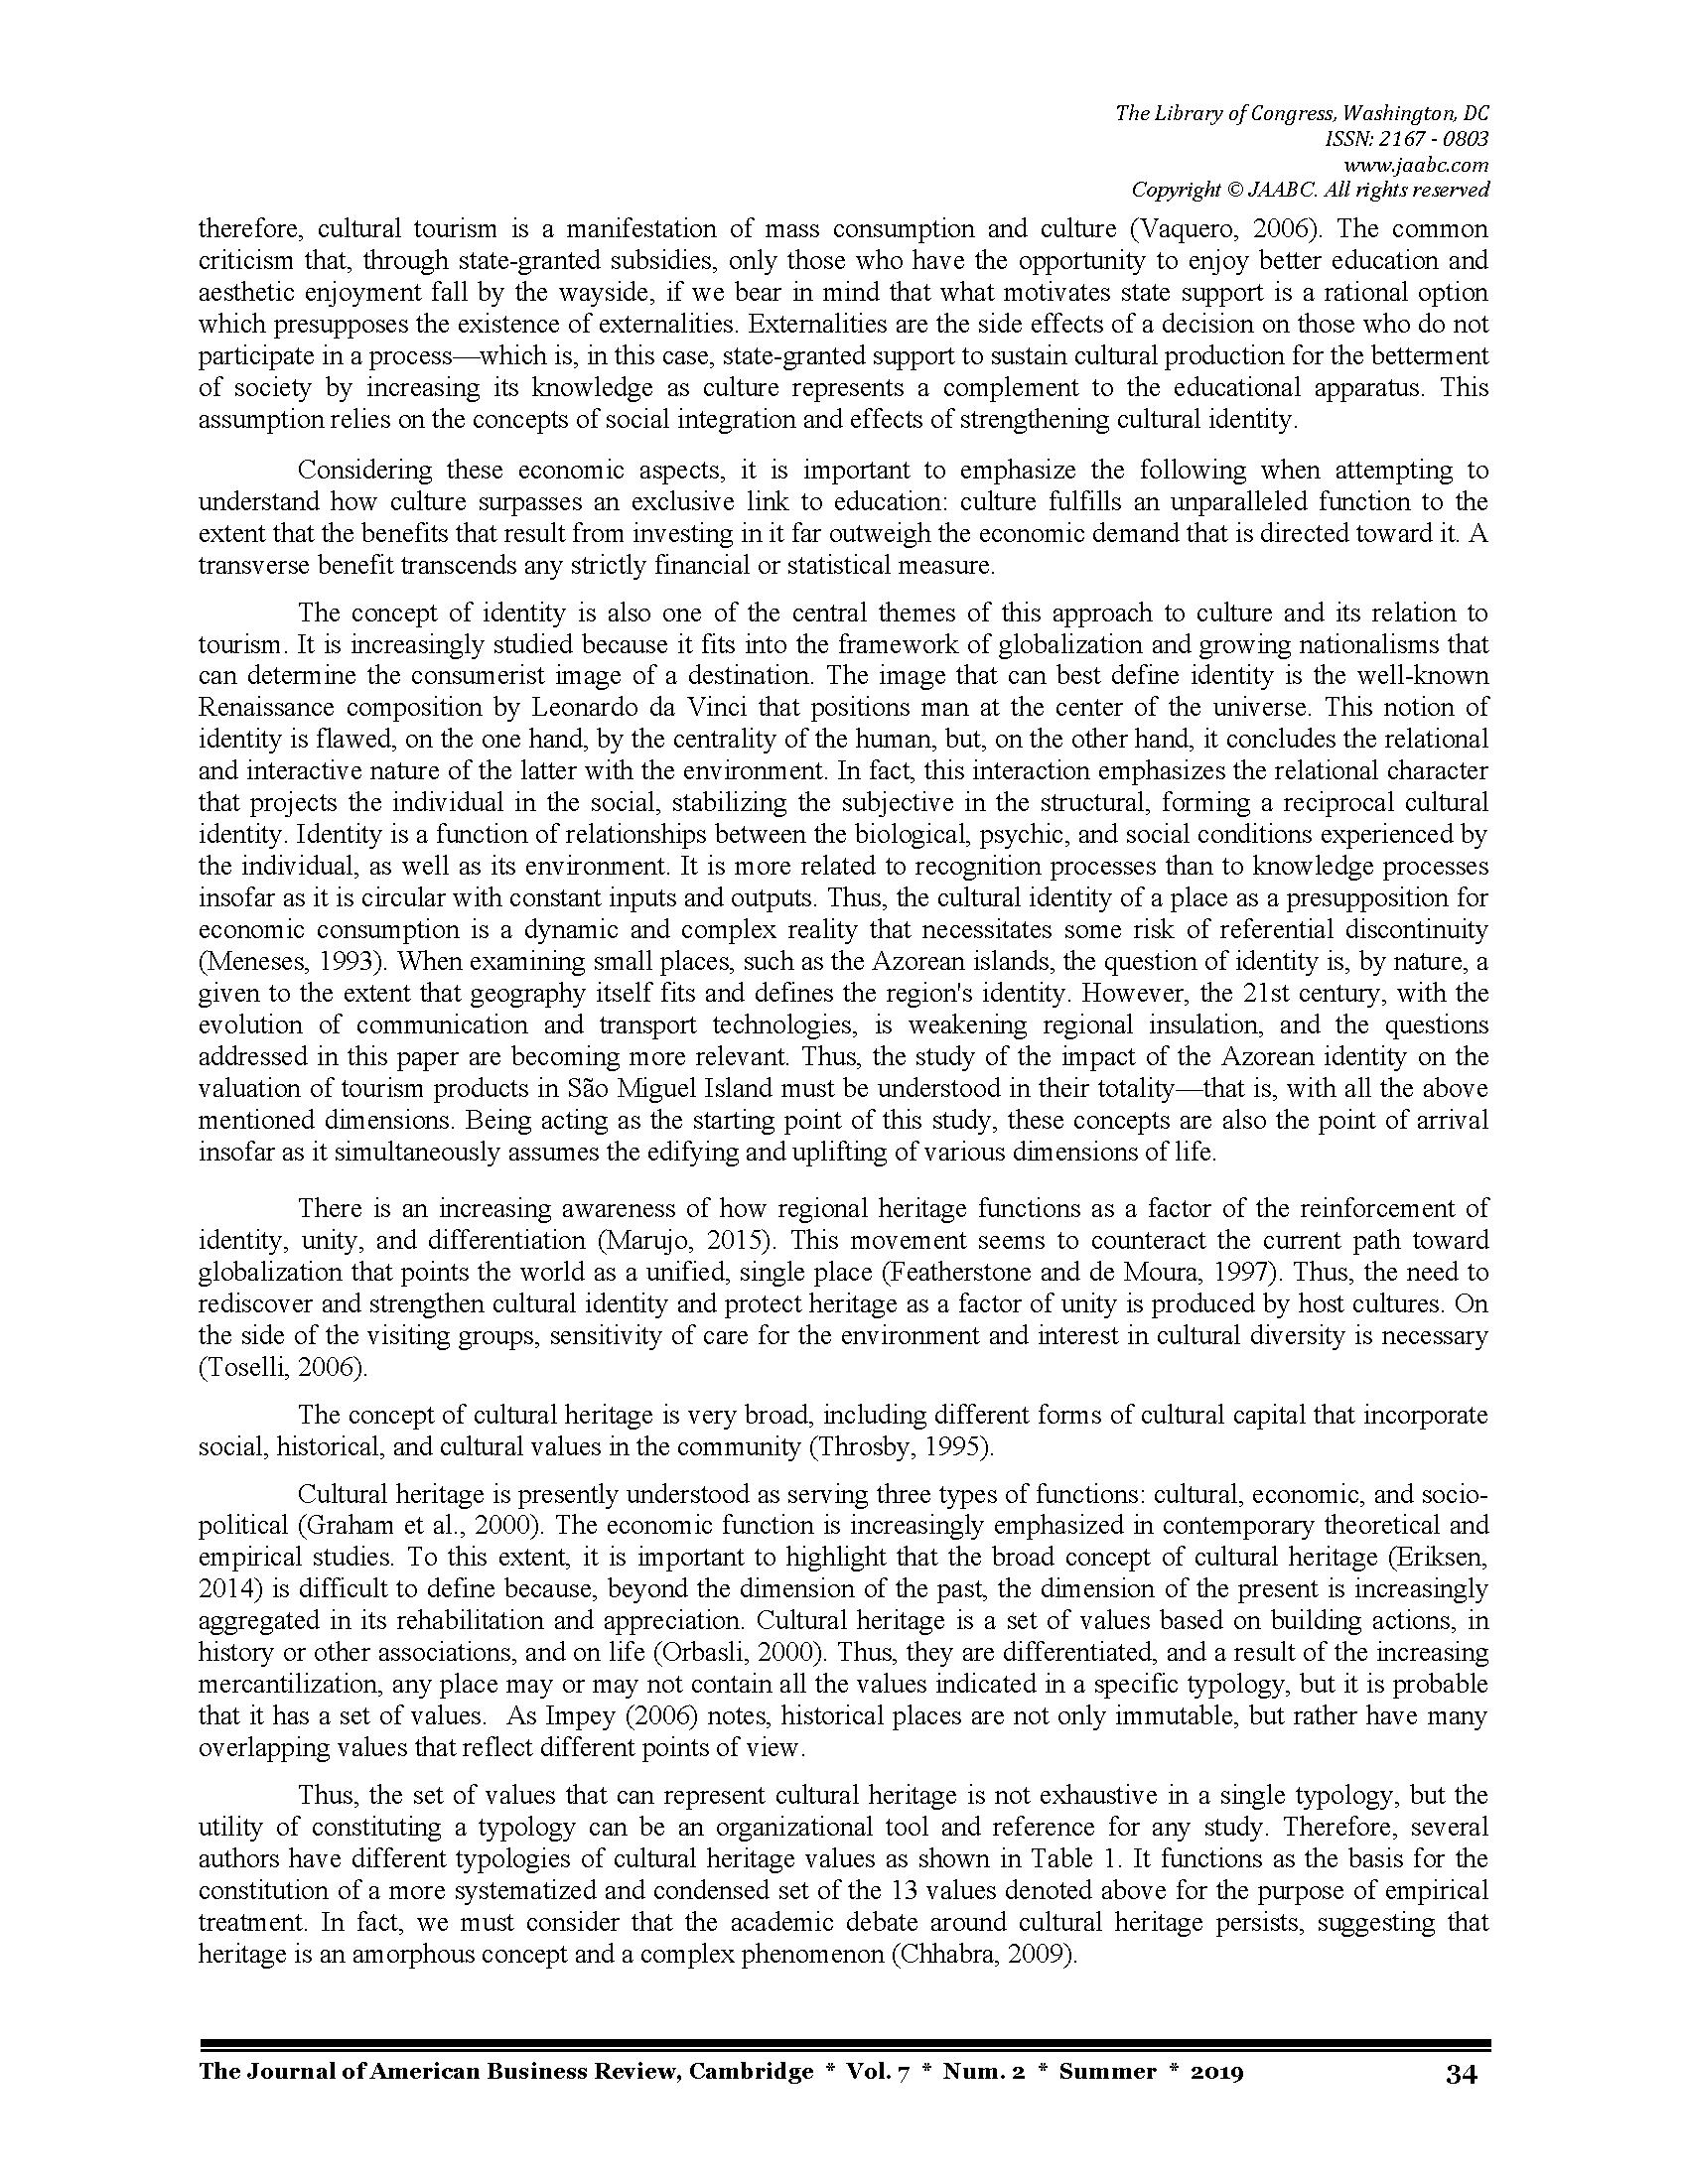 Ralph emerson thesis